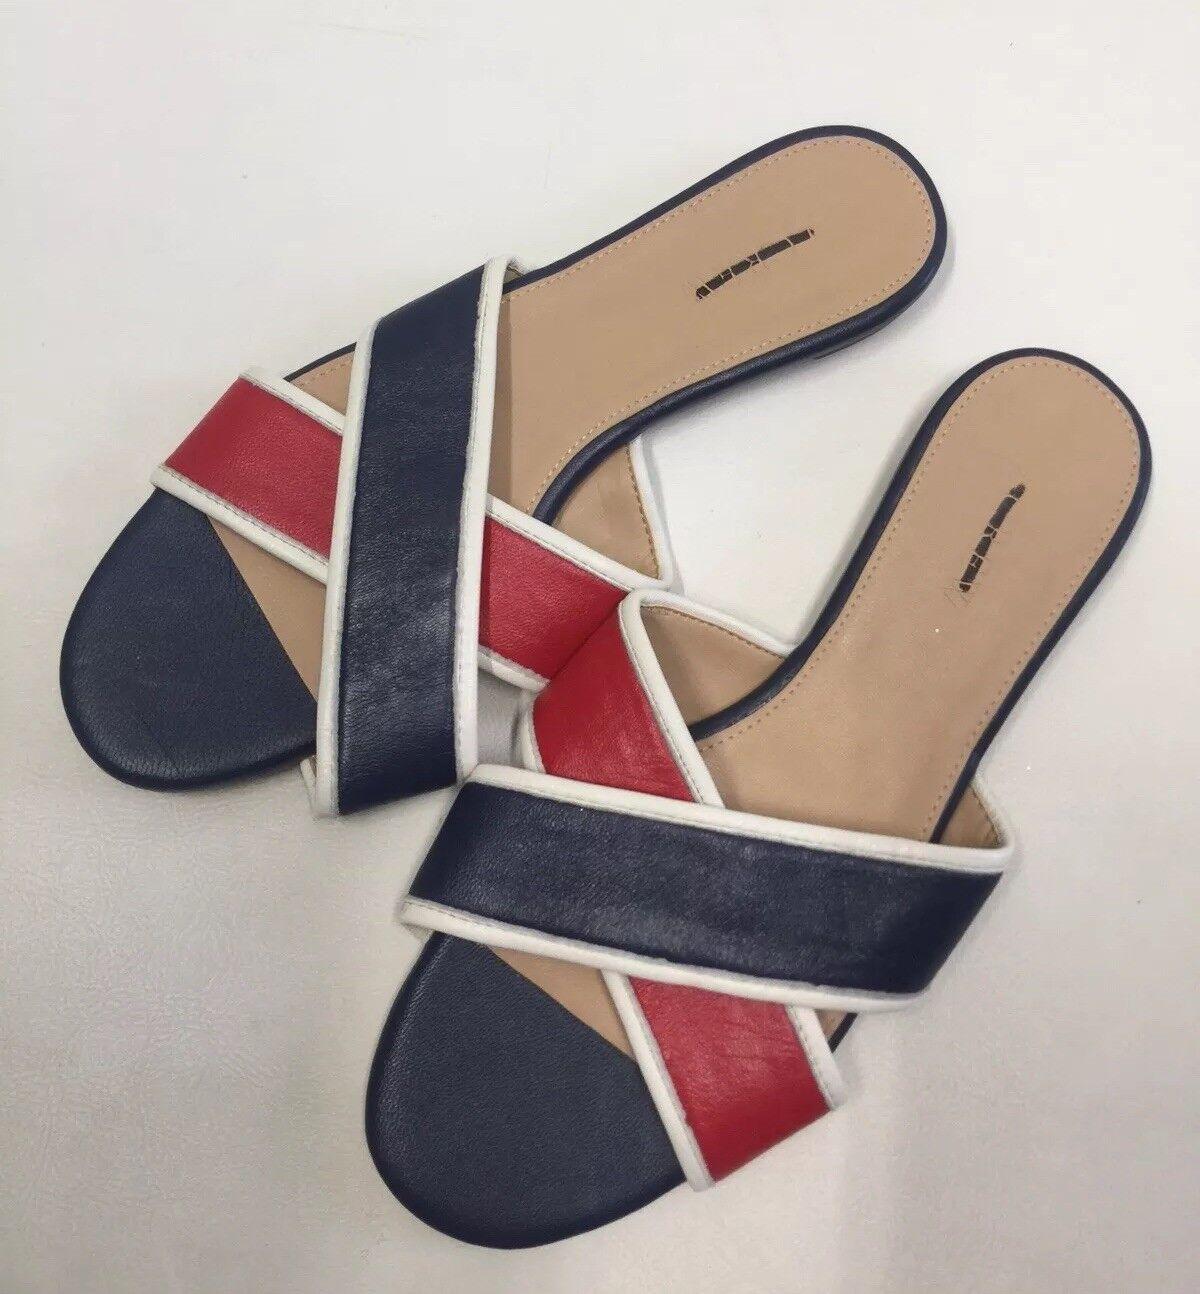 JCrew colorblock Cora crisscross sandals Red bluee 6 leather shoes flats H8777